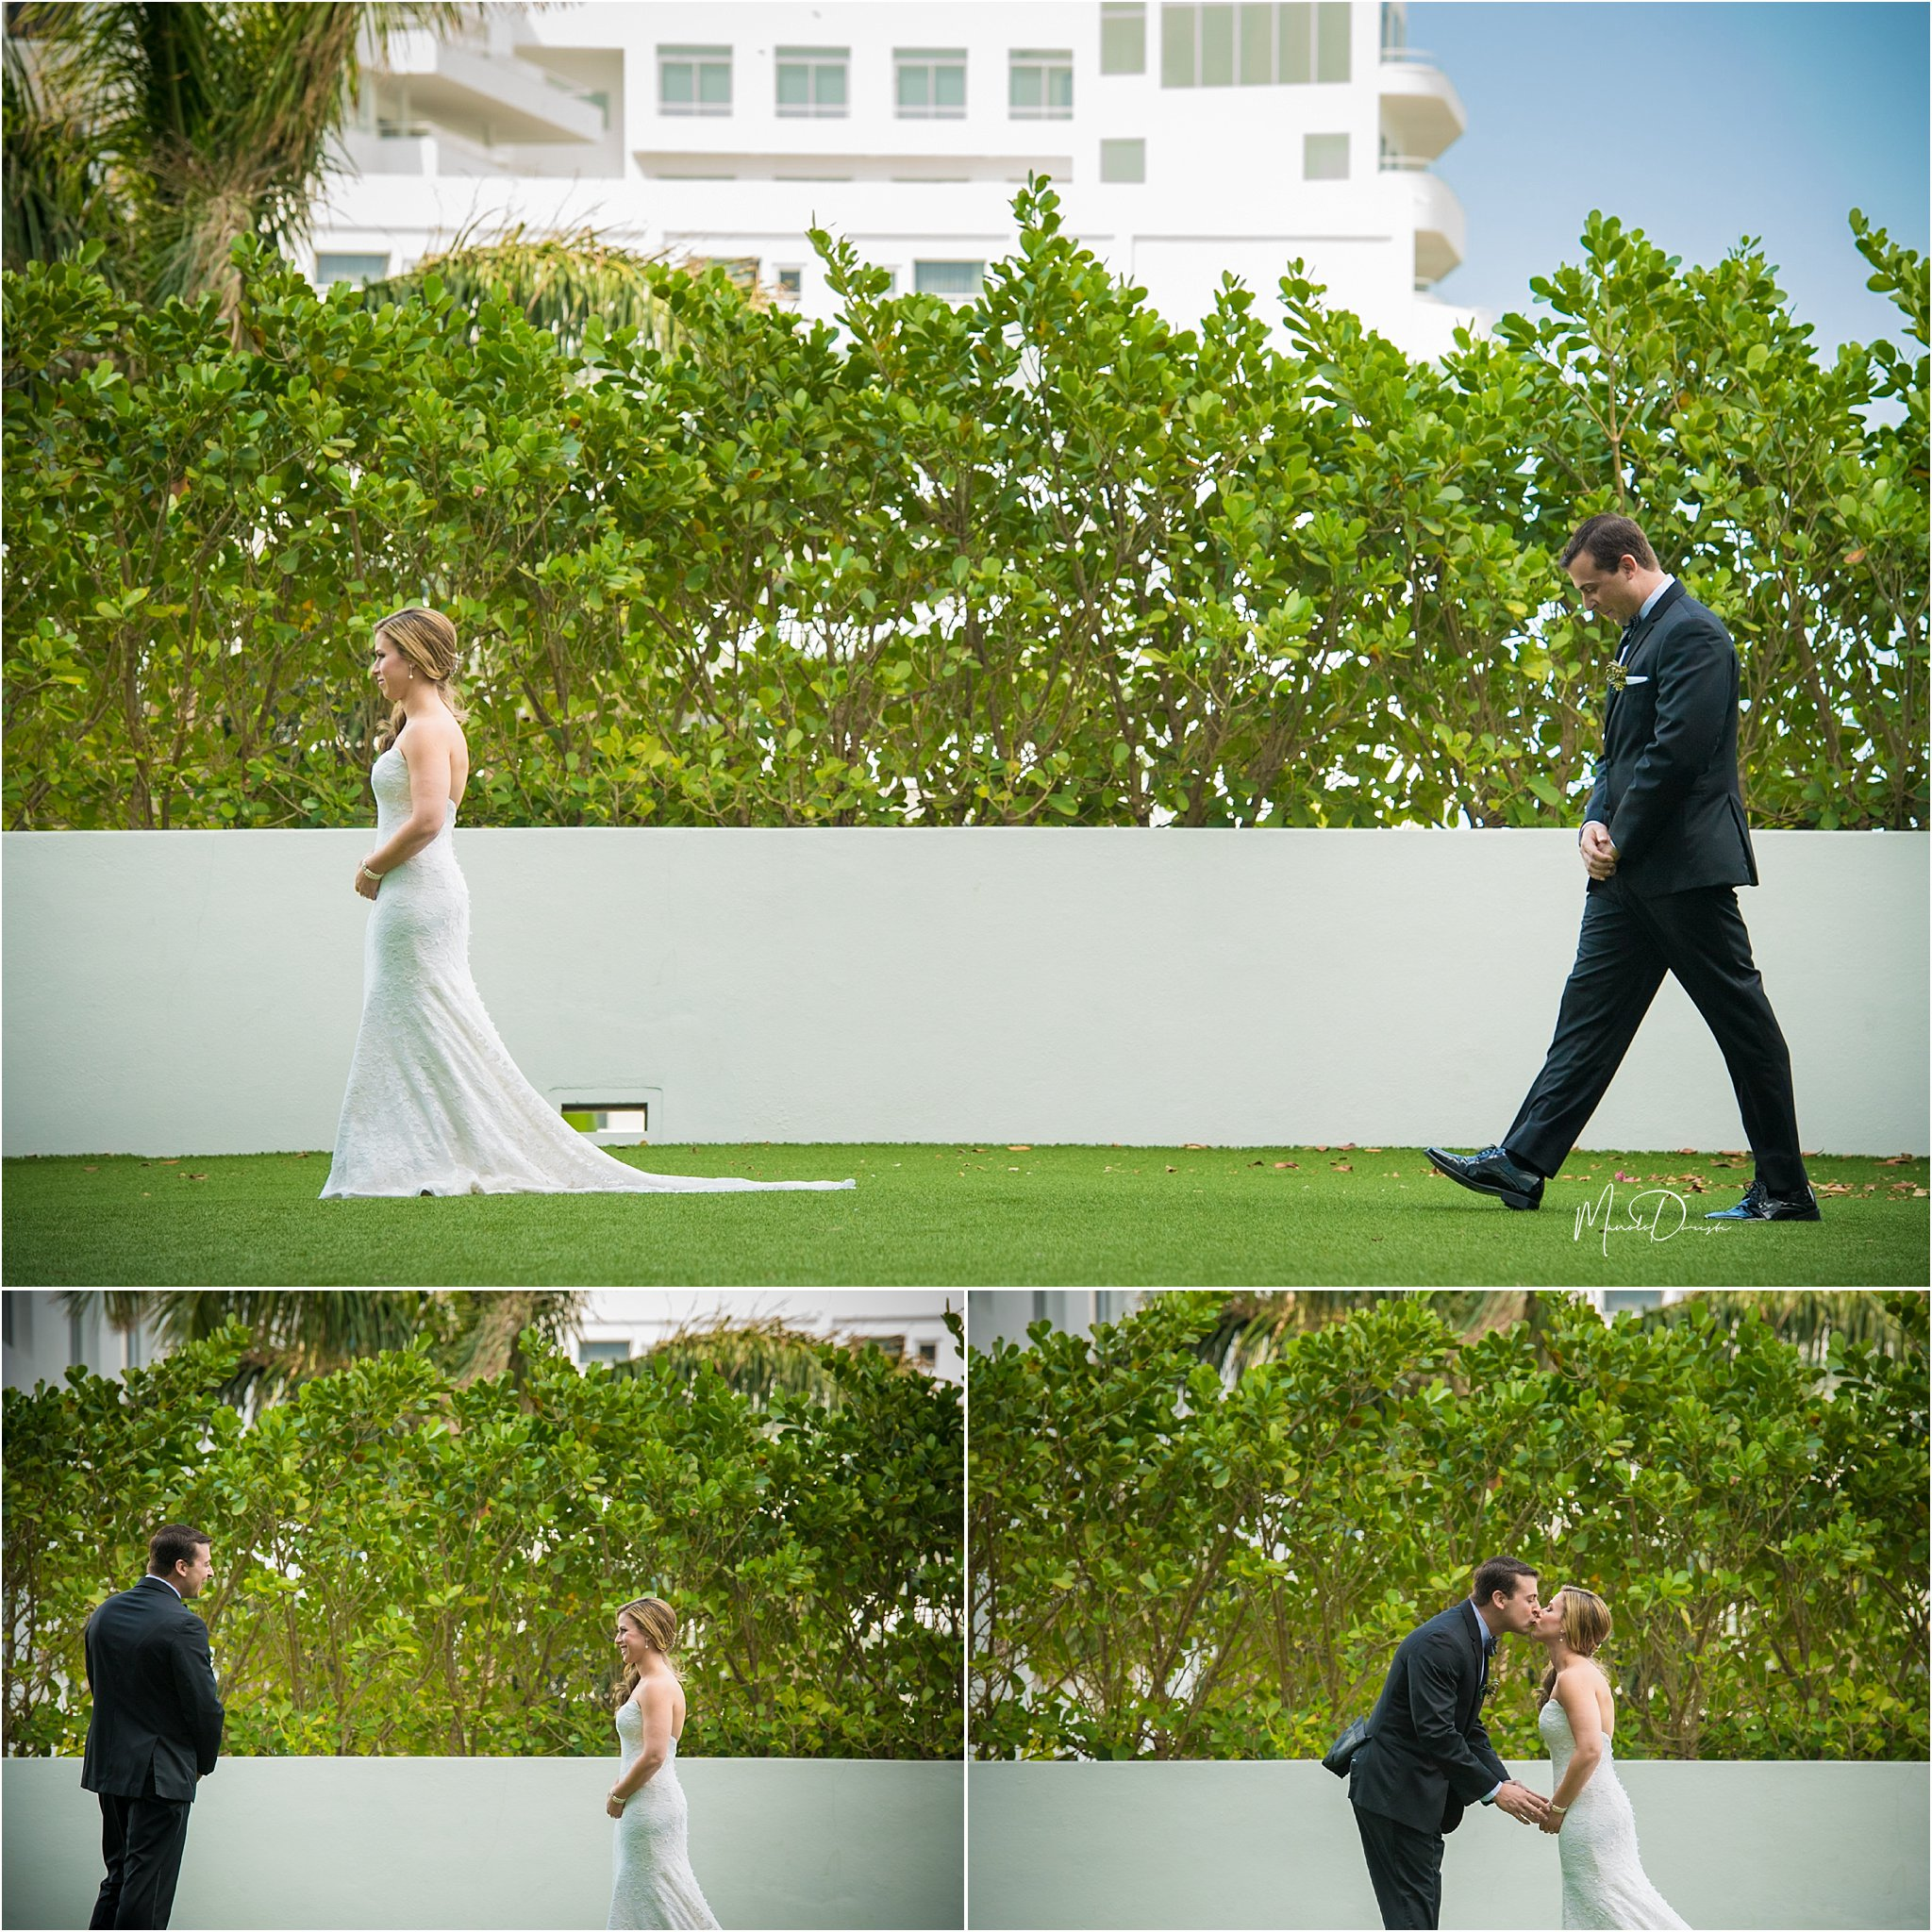 0661_ManoloDoreste_InFocusStudios_Wedding_Family_Photography_Miami_MiamiPhotographer.jpg